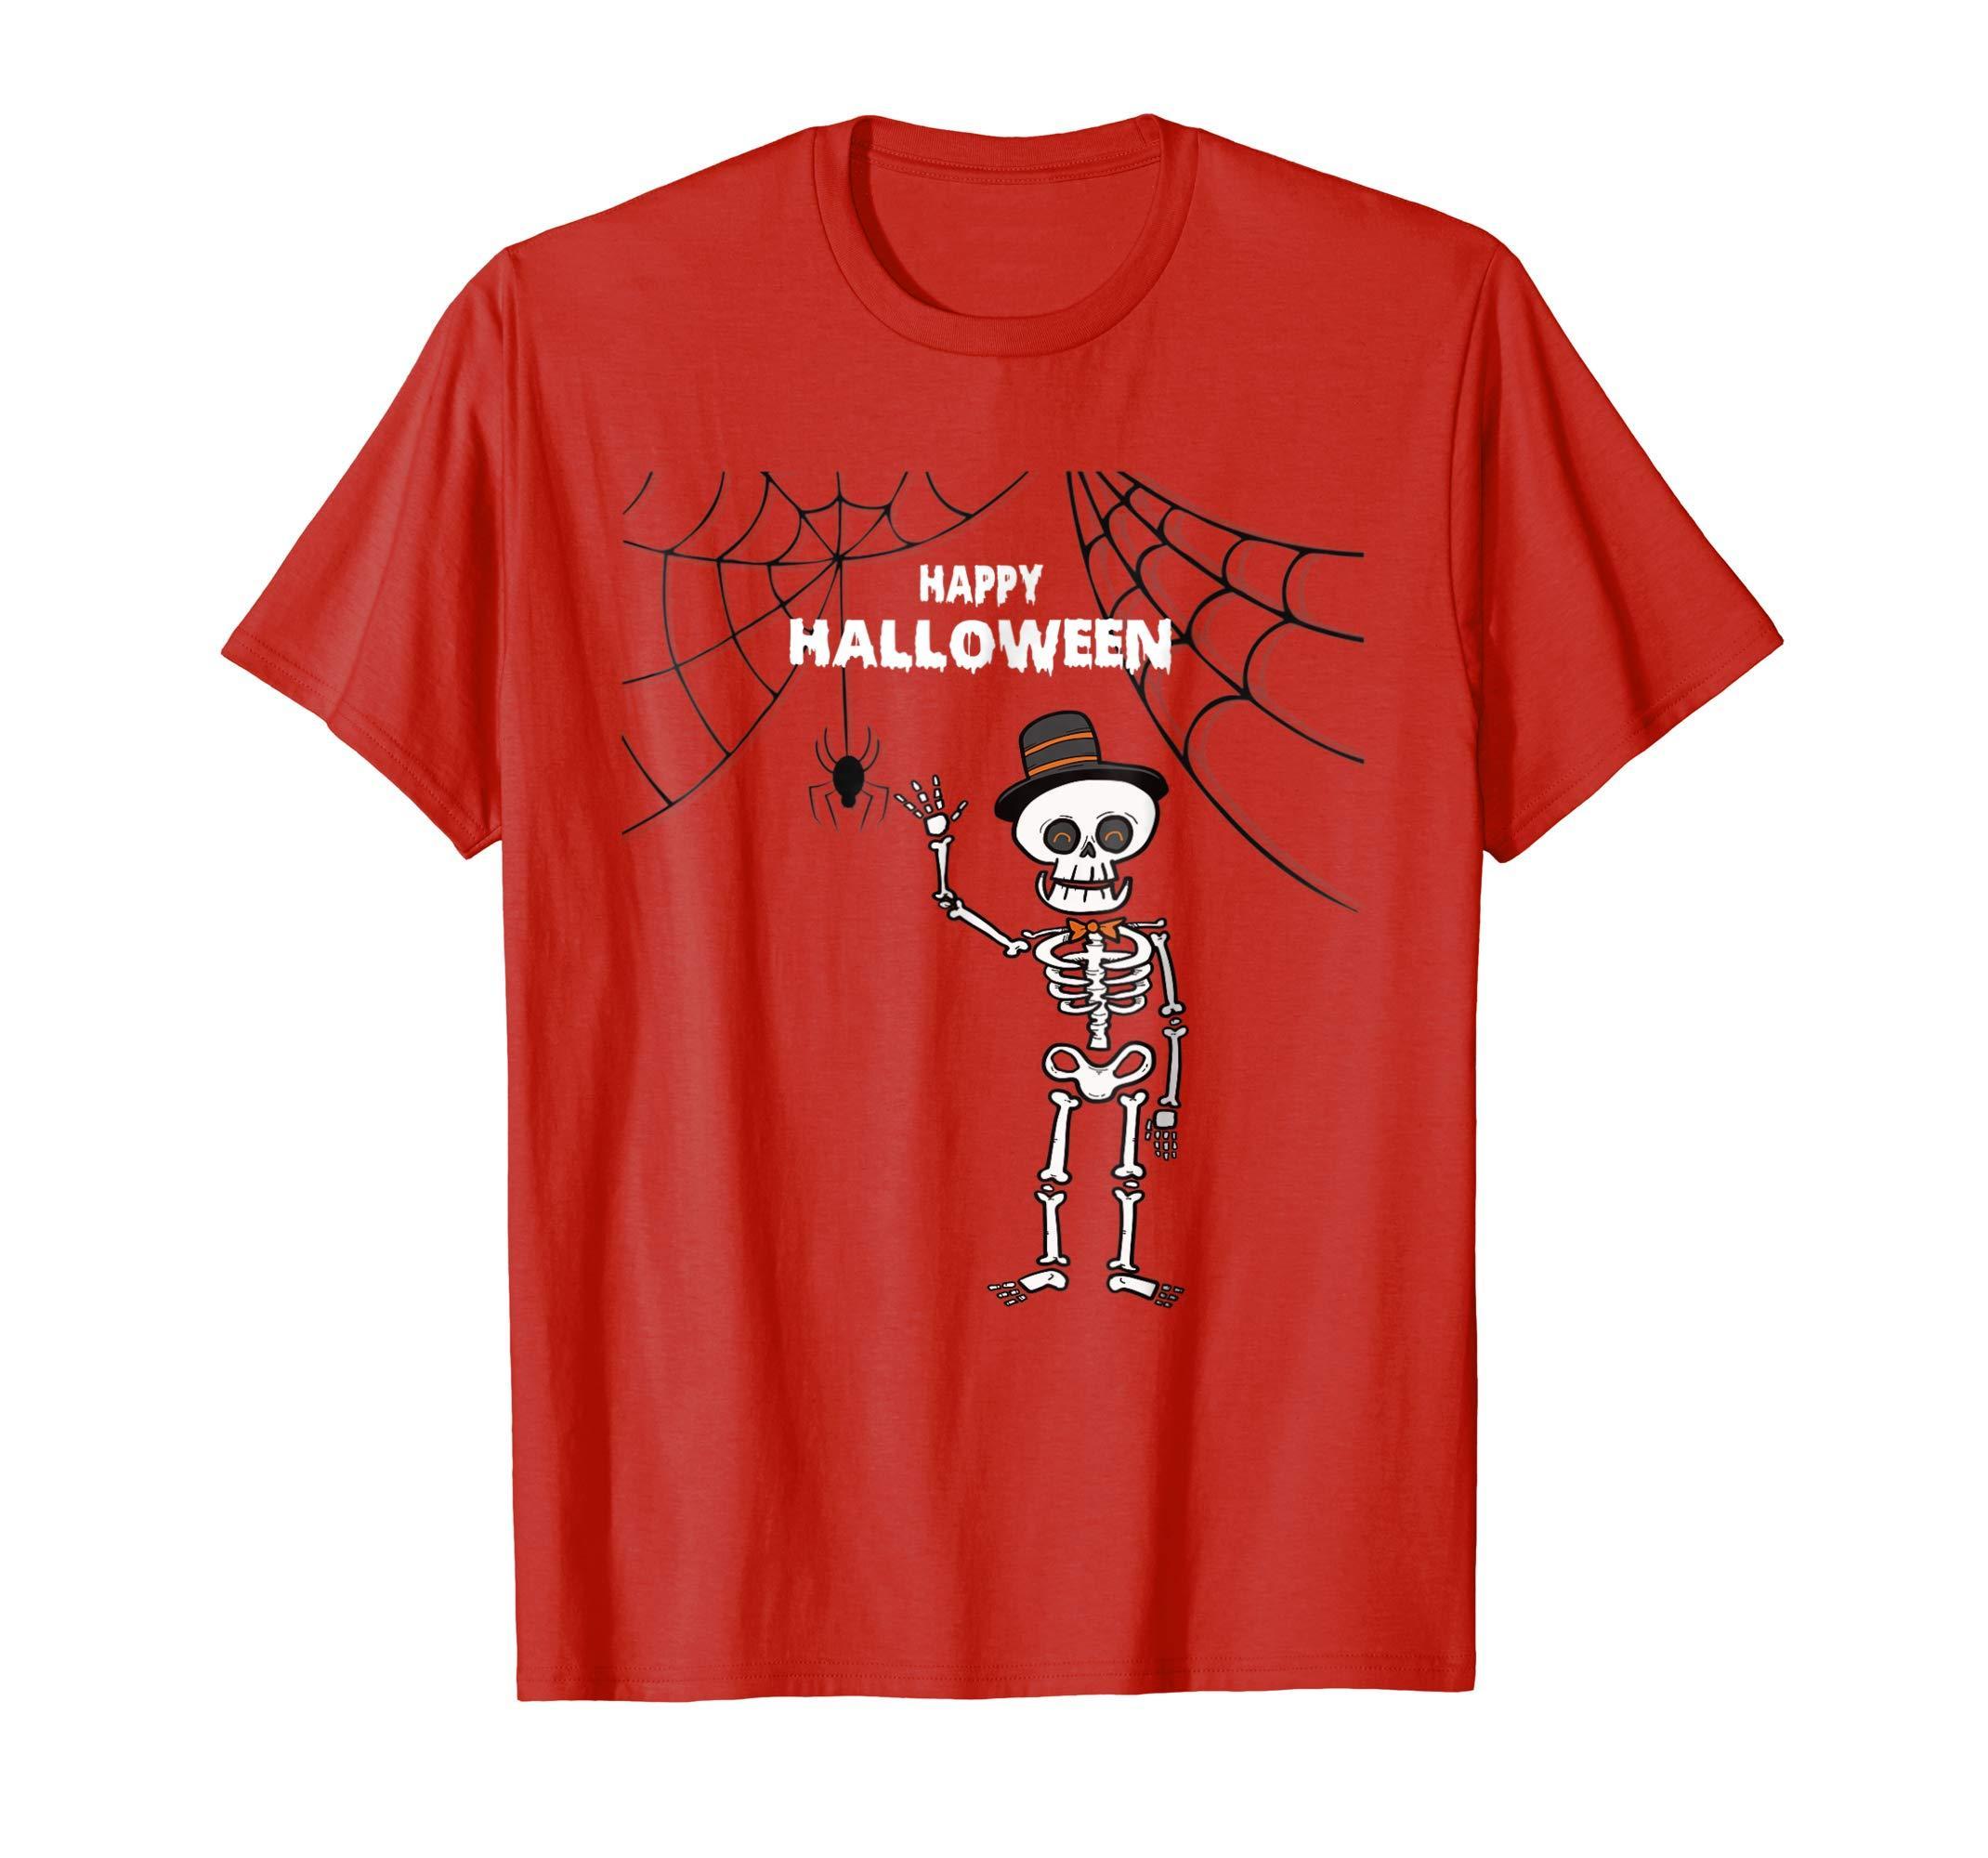 High Quality Funny Halloween Tshirt Halloween 2018 Many Type